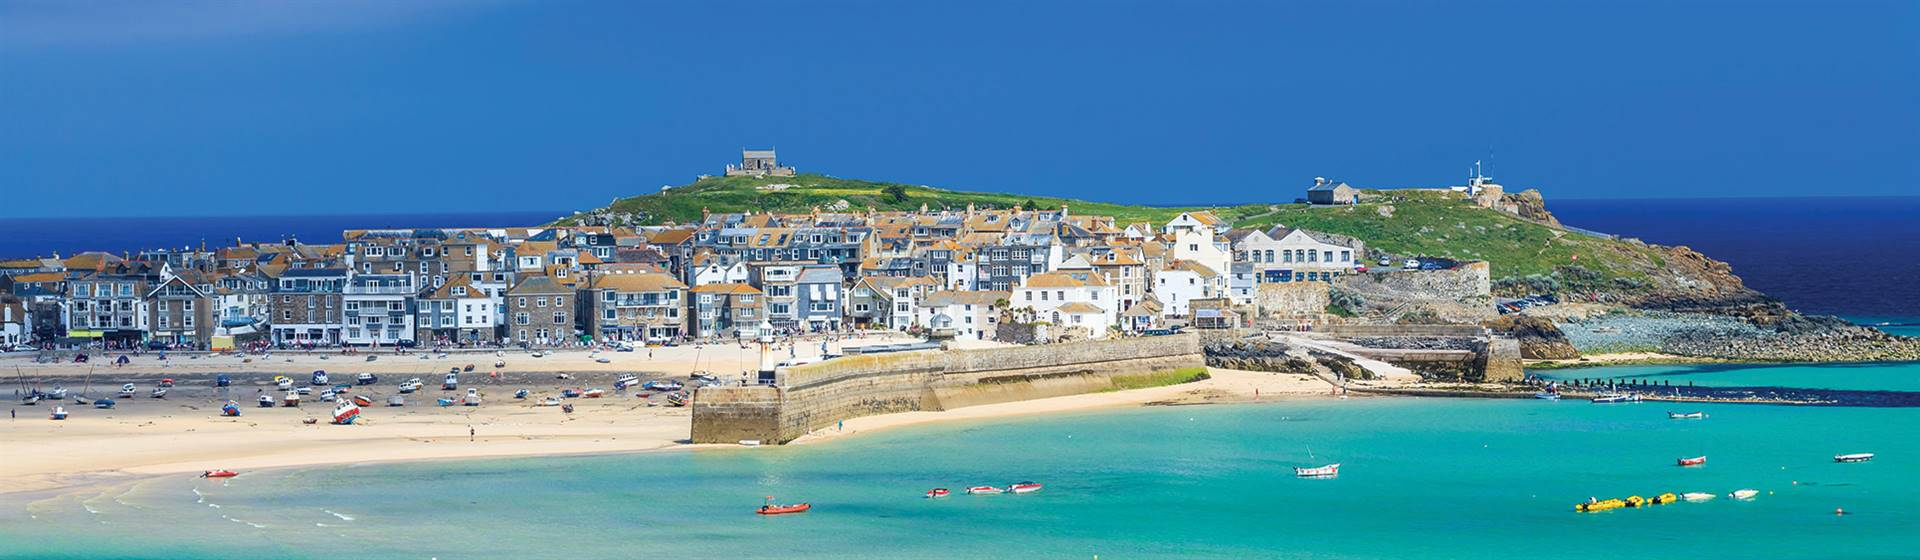 Colourful Cornish Highlights - Rosemundy House Htl